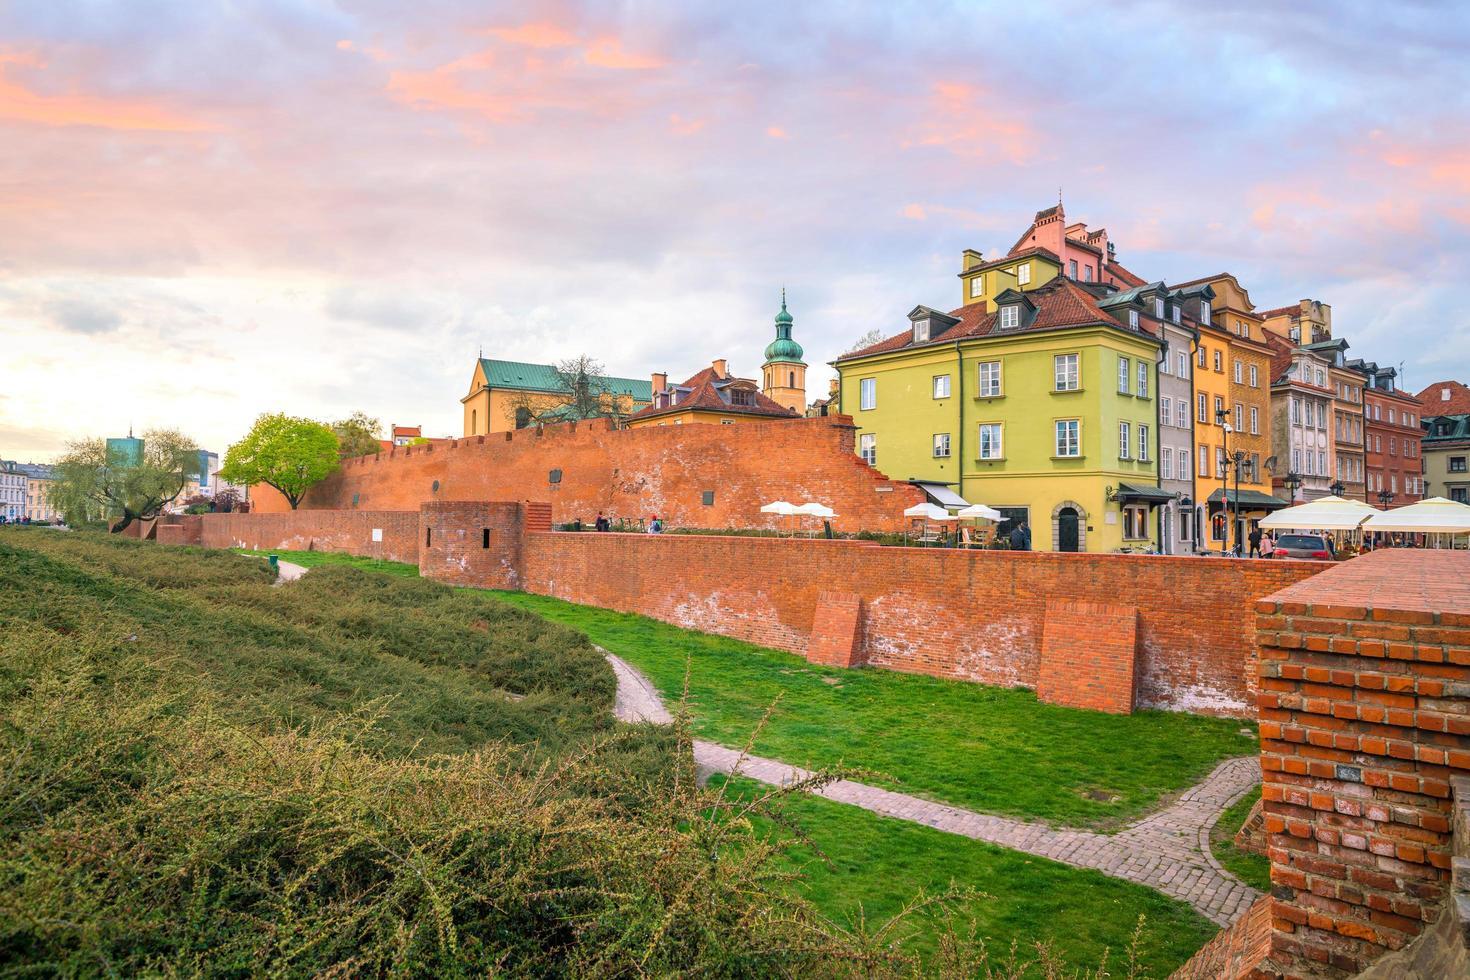 città vecchia a varsavia, polonia foto